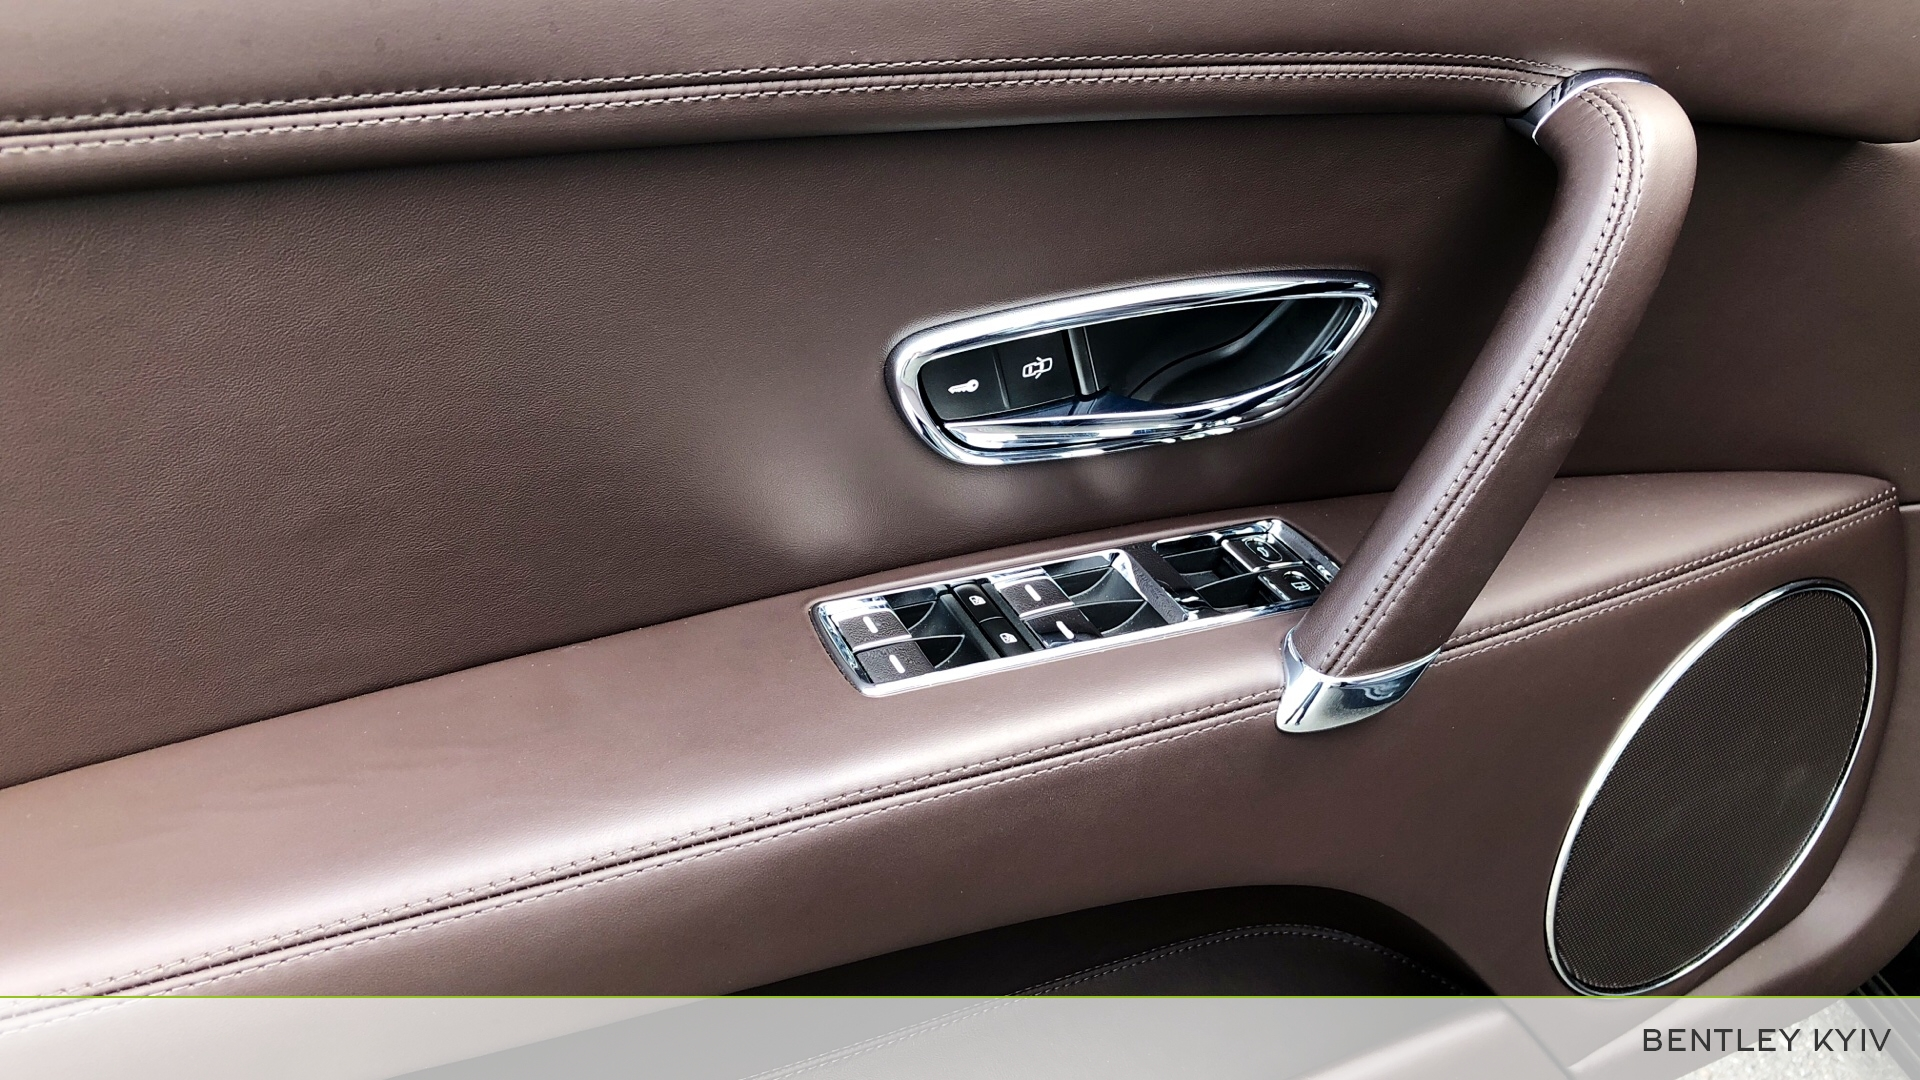 Bentley Flying Spur V8 S used car for sale in Kiev